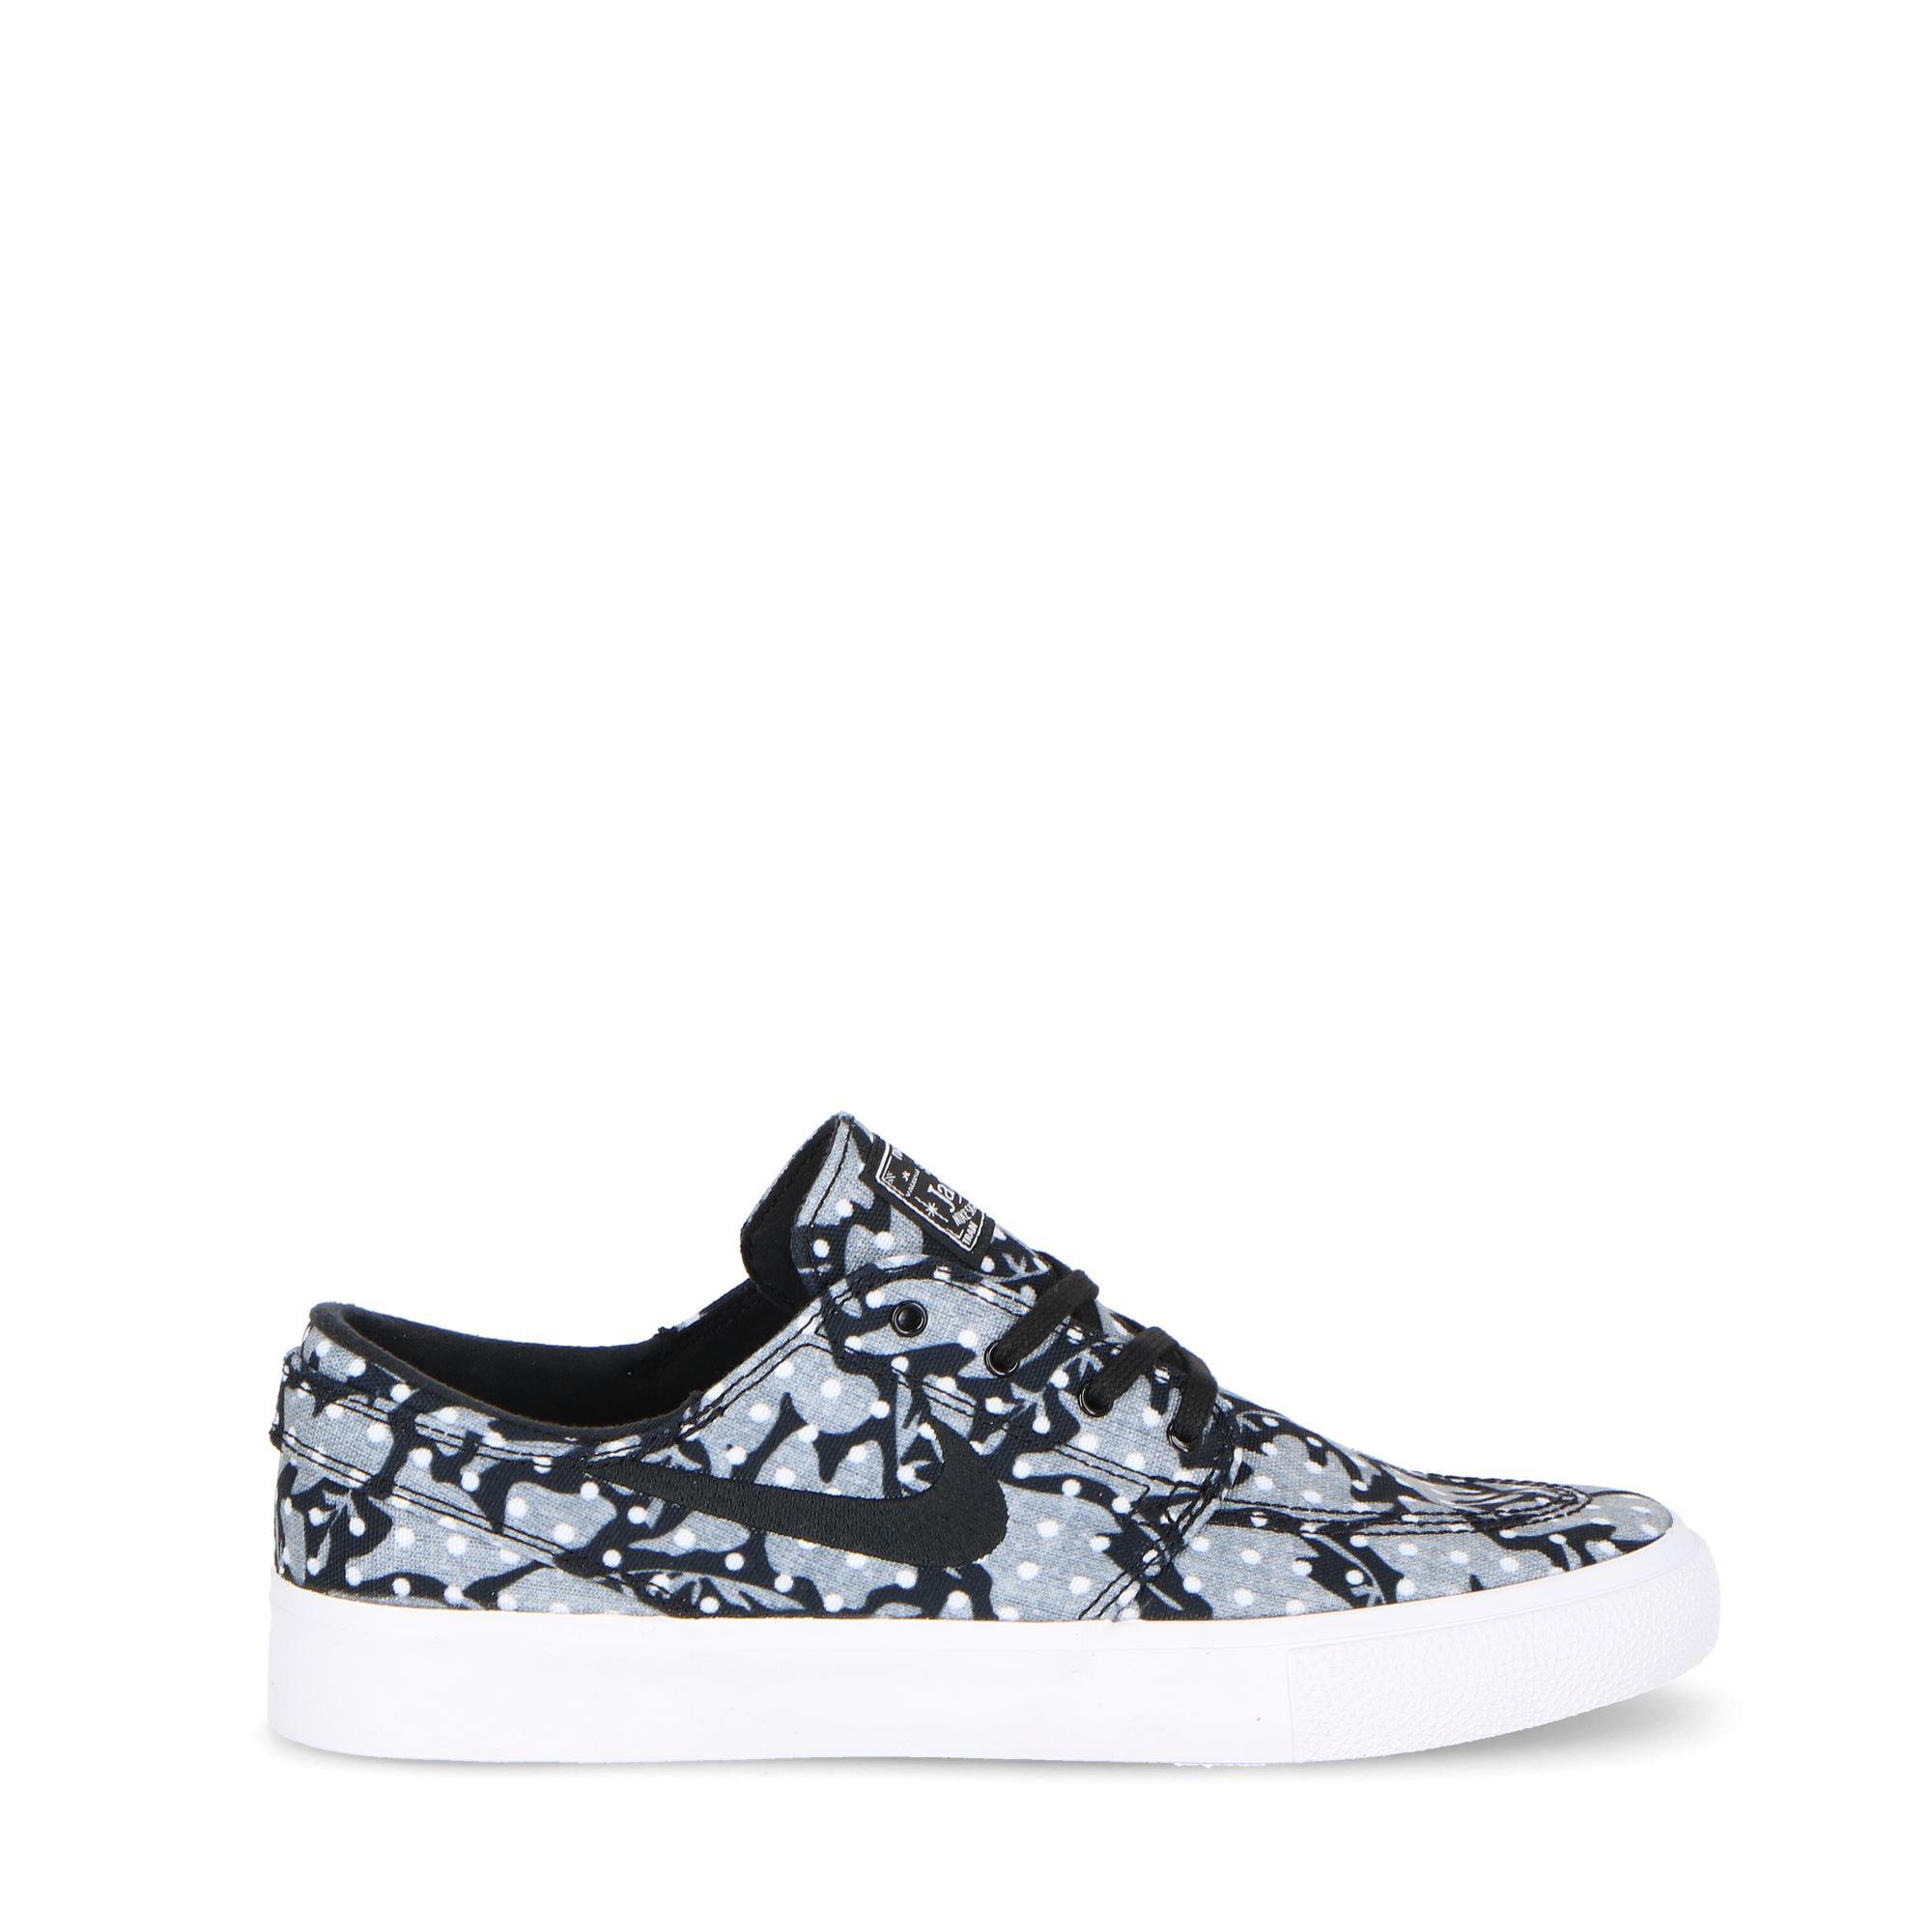 outlet store bd8ce c8da5 Nike Sb Zoom Janoski Canvas Rm Black white grey